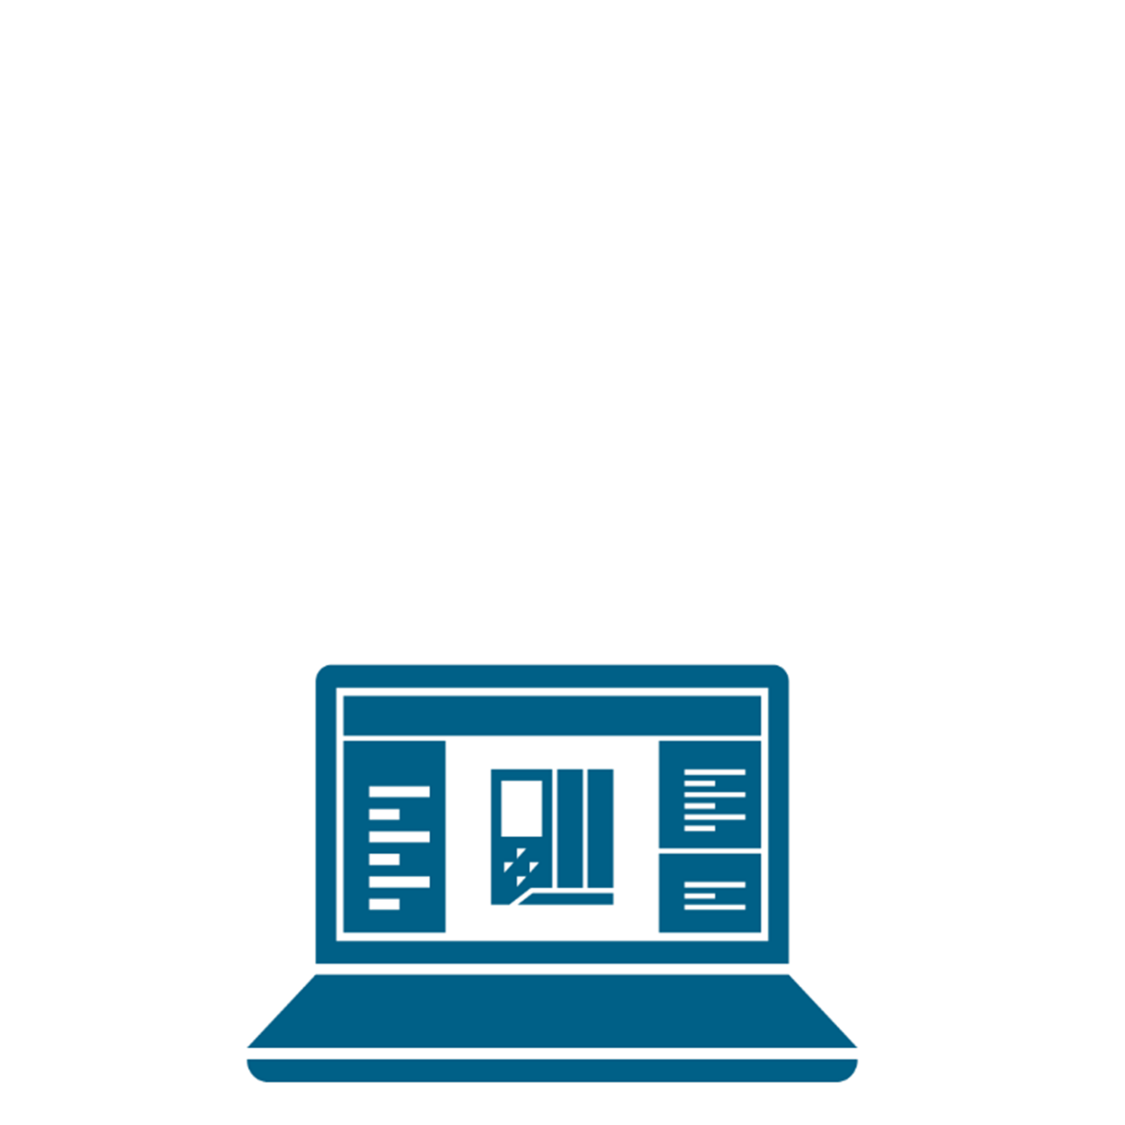 TIA Portal'da daha hızlı konfigürasyon